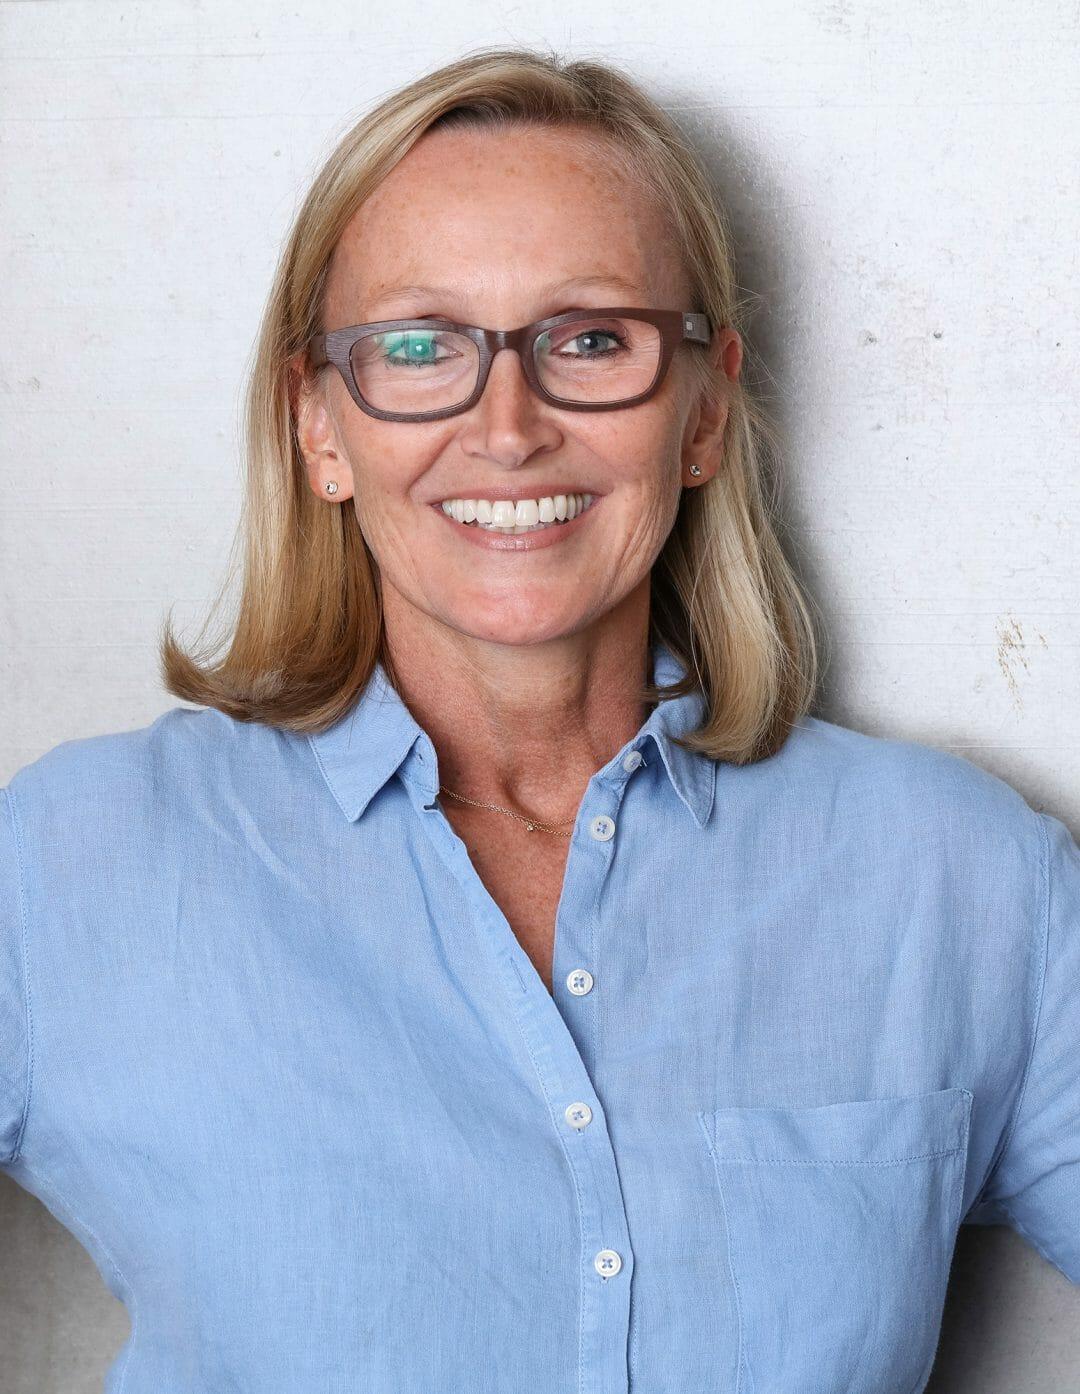 Sabine Scherer - Head of people at Ananda Impact Ventures